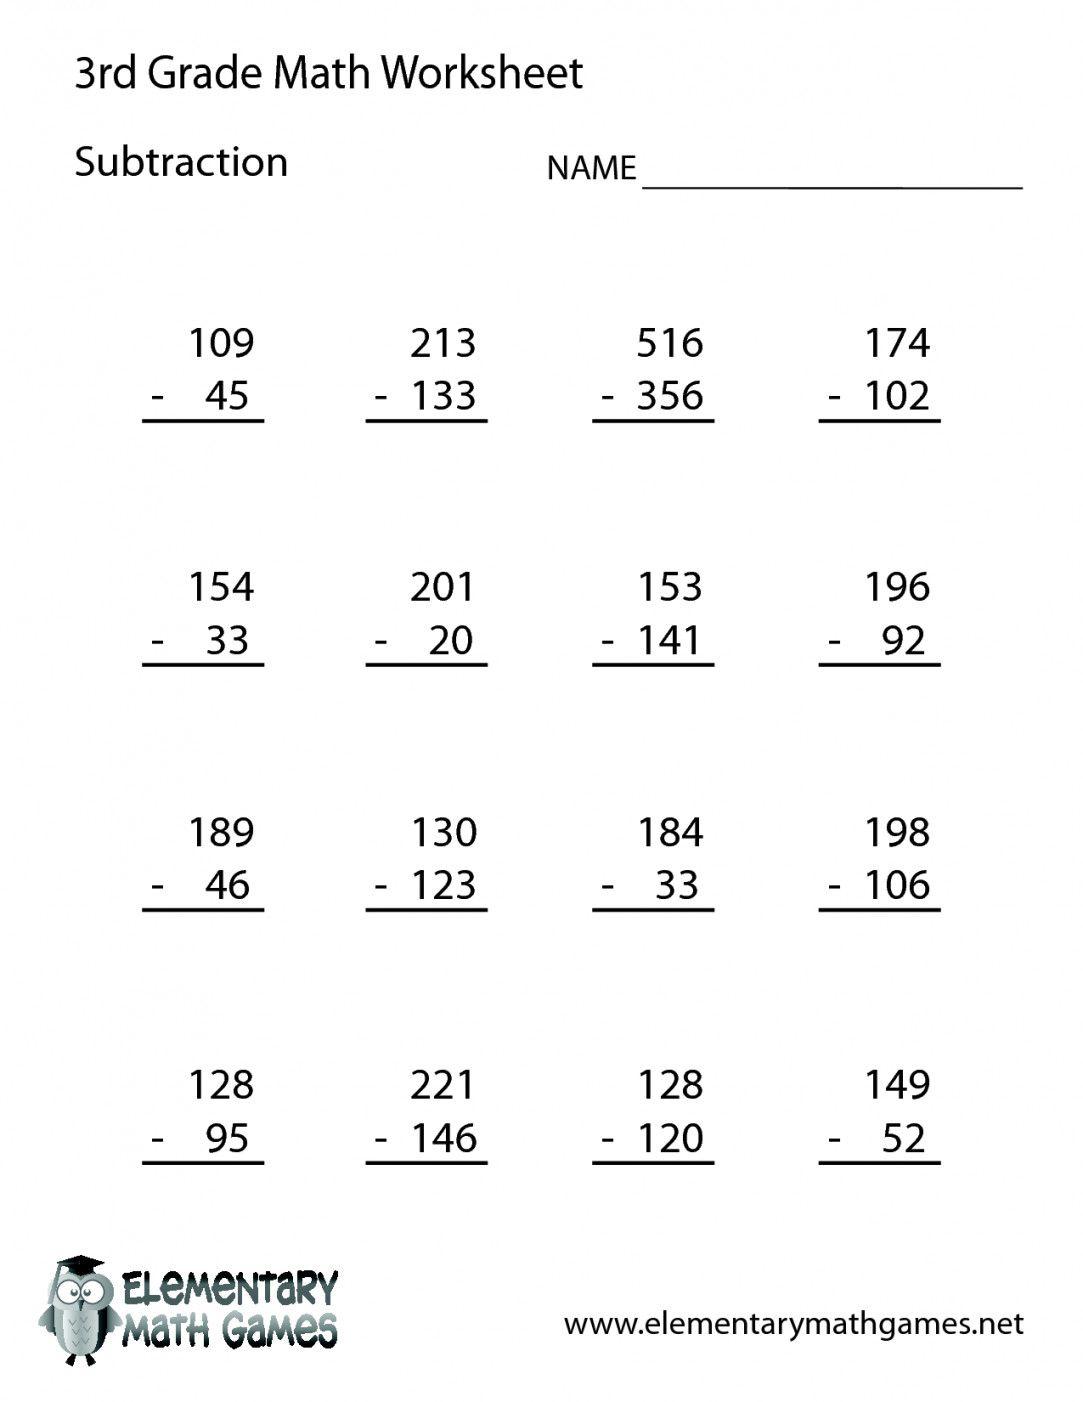 Free Printable 7Th Grade Math Worksheets | Lostranquillos - 7Th Grade Worksheets Free Printable